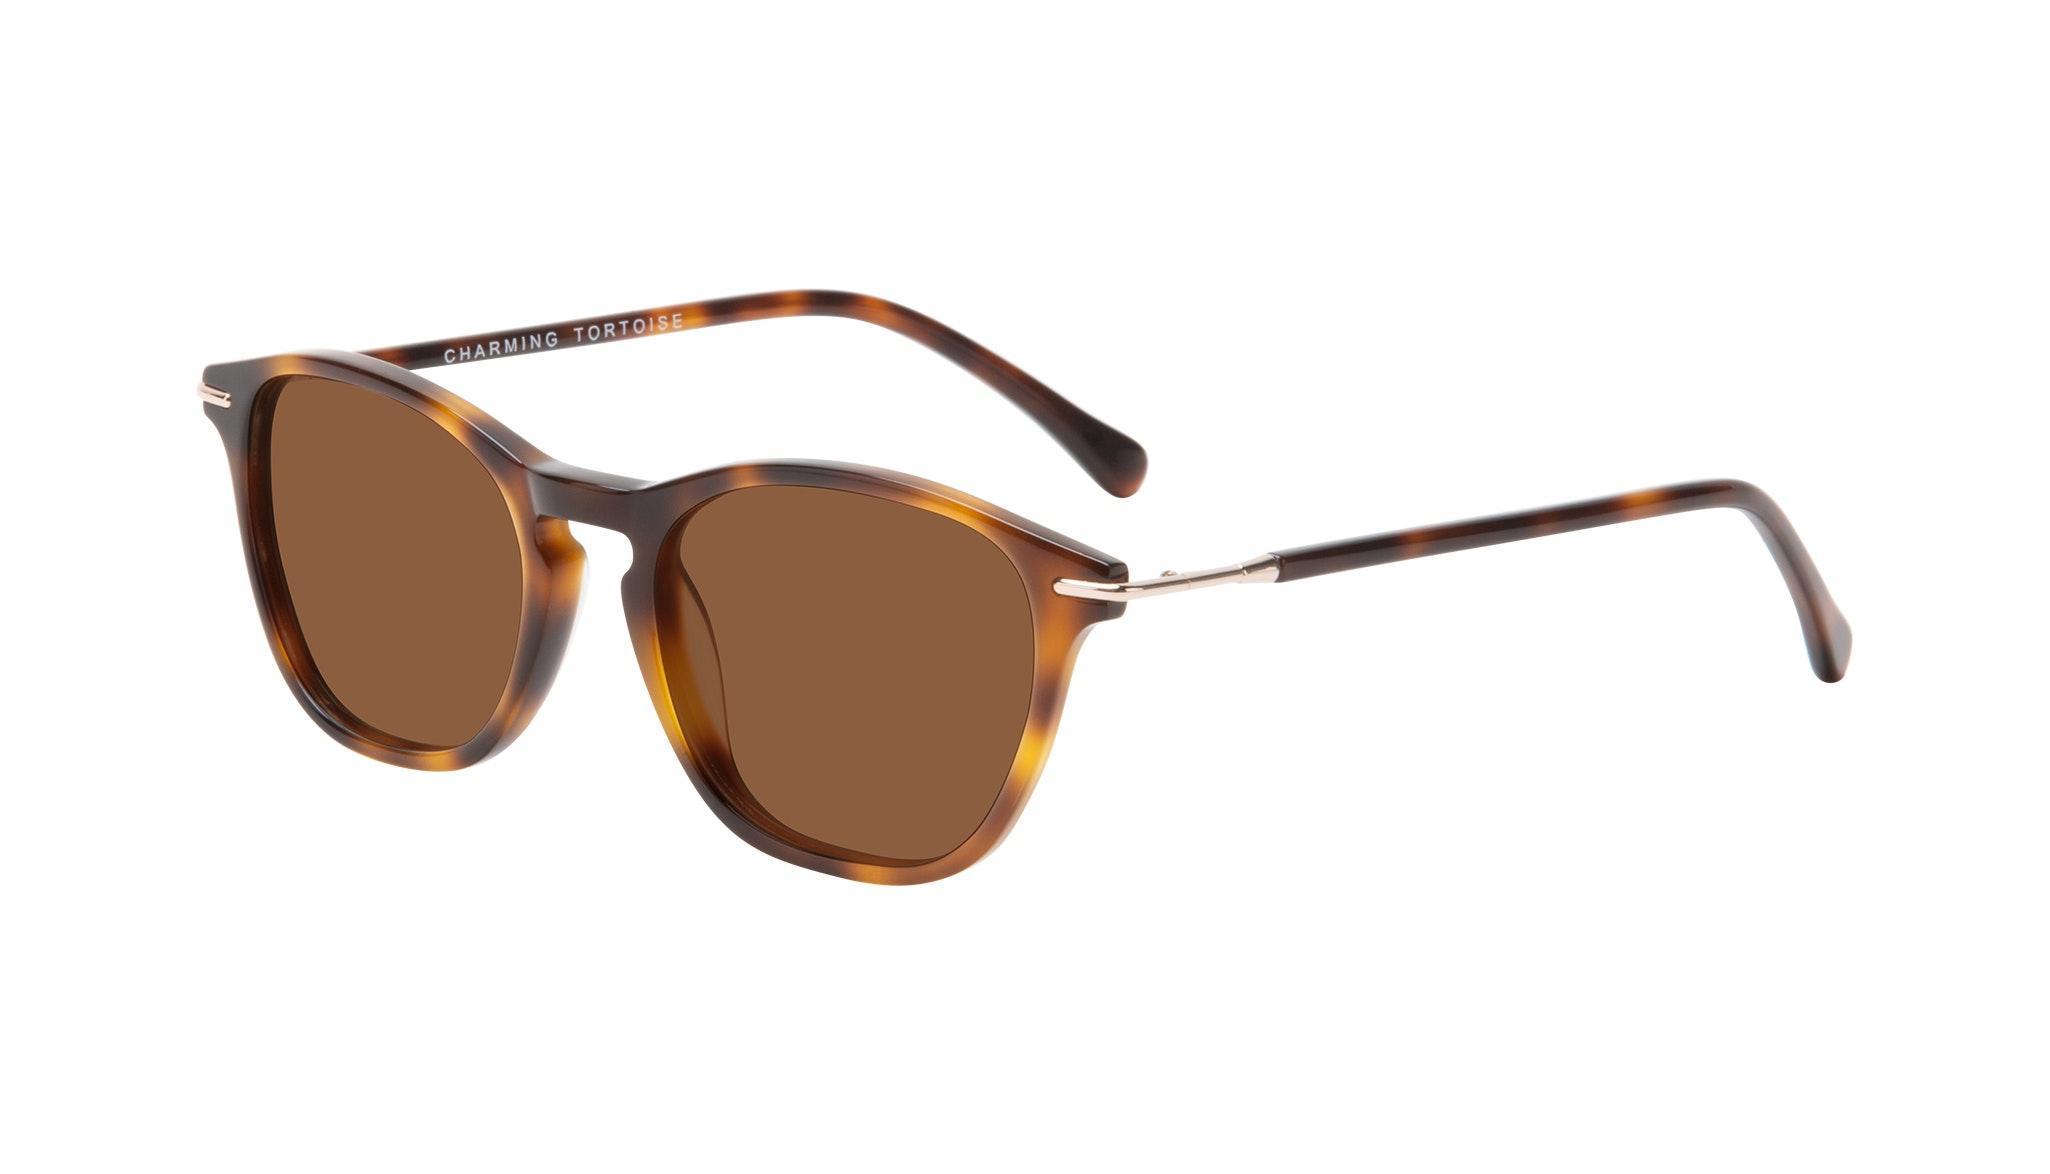 Affordable Fashion Glasses Square Sunglasses Women Charming Tortoise Tilt